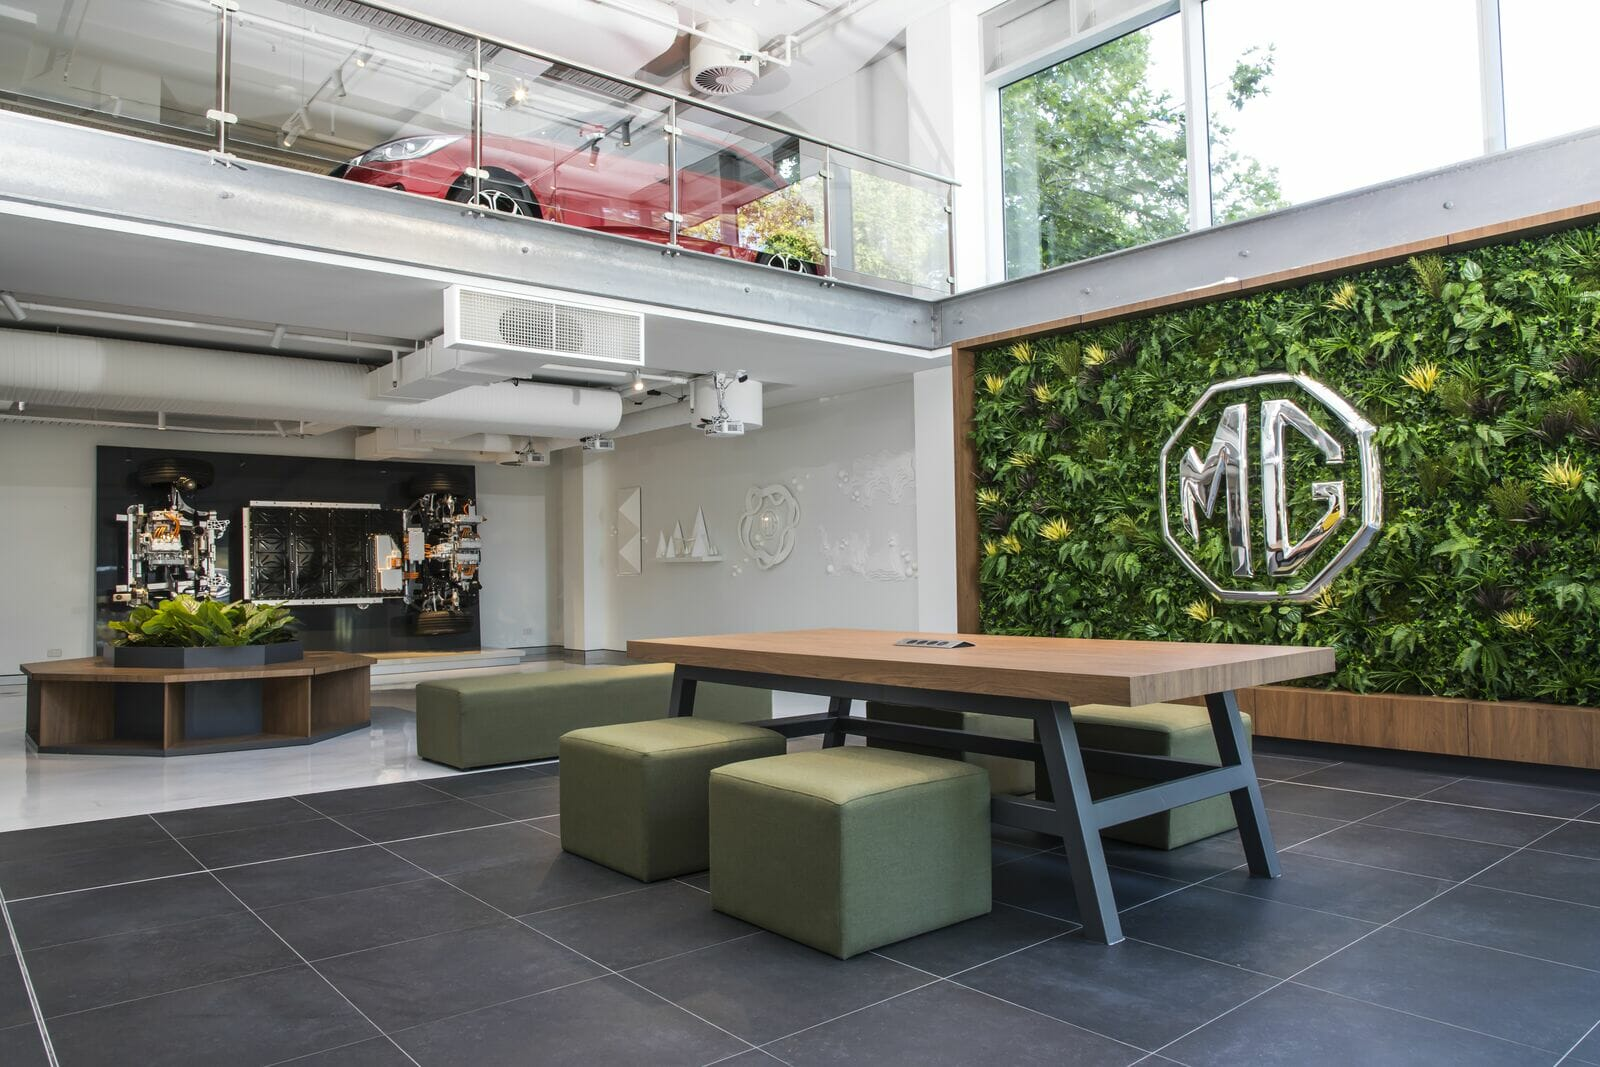 MG Motor Sydney Flagship